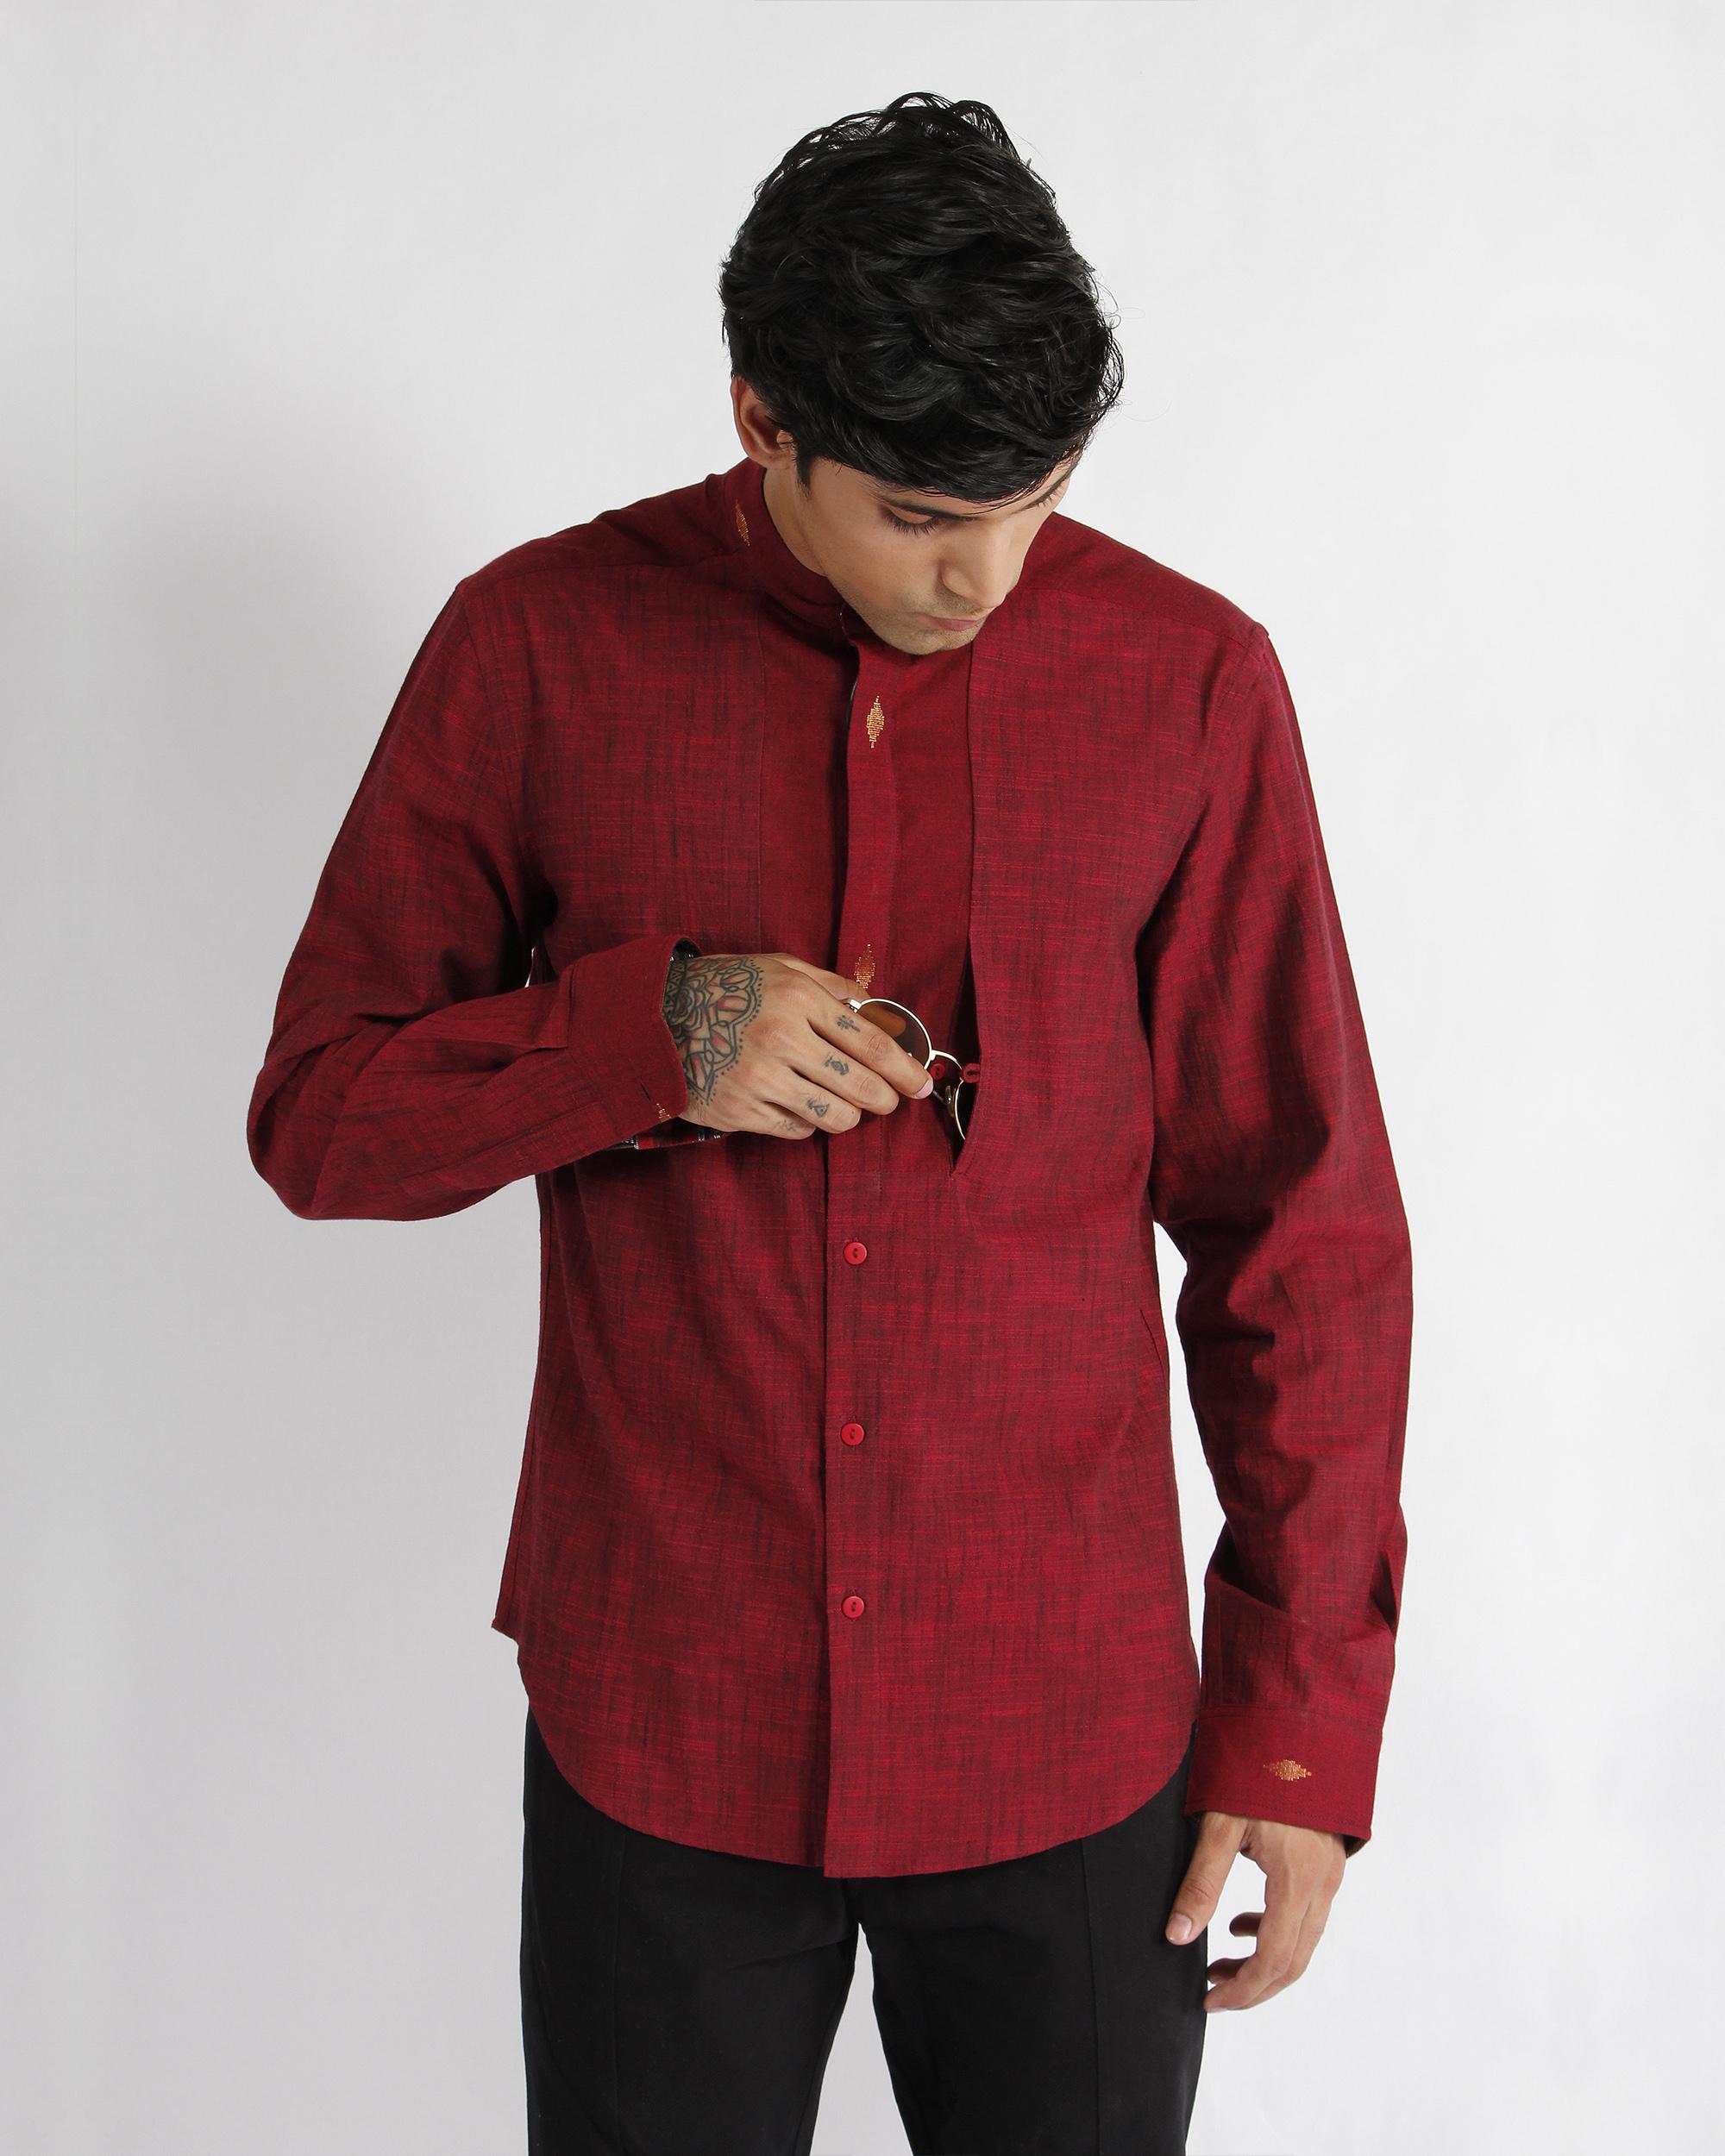 Maroon Handwoven Cotton Slub Dress Shirt